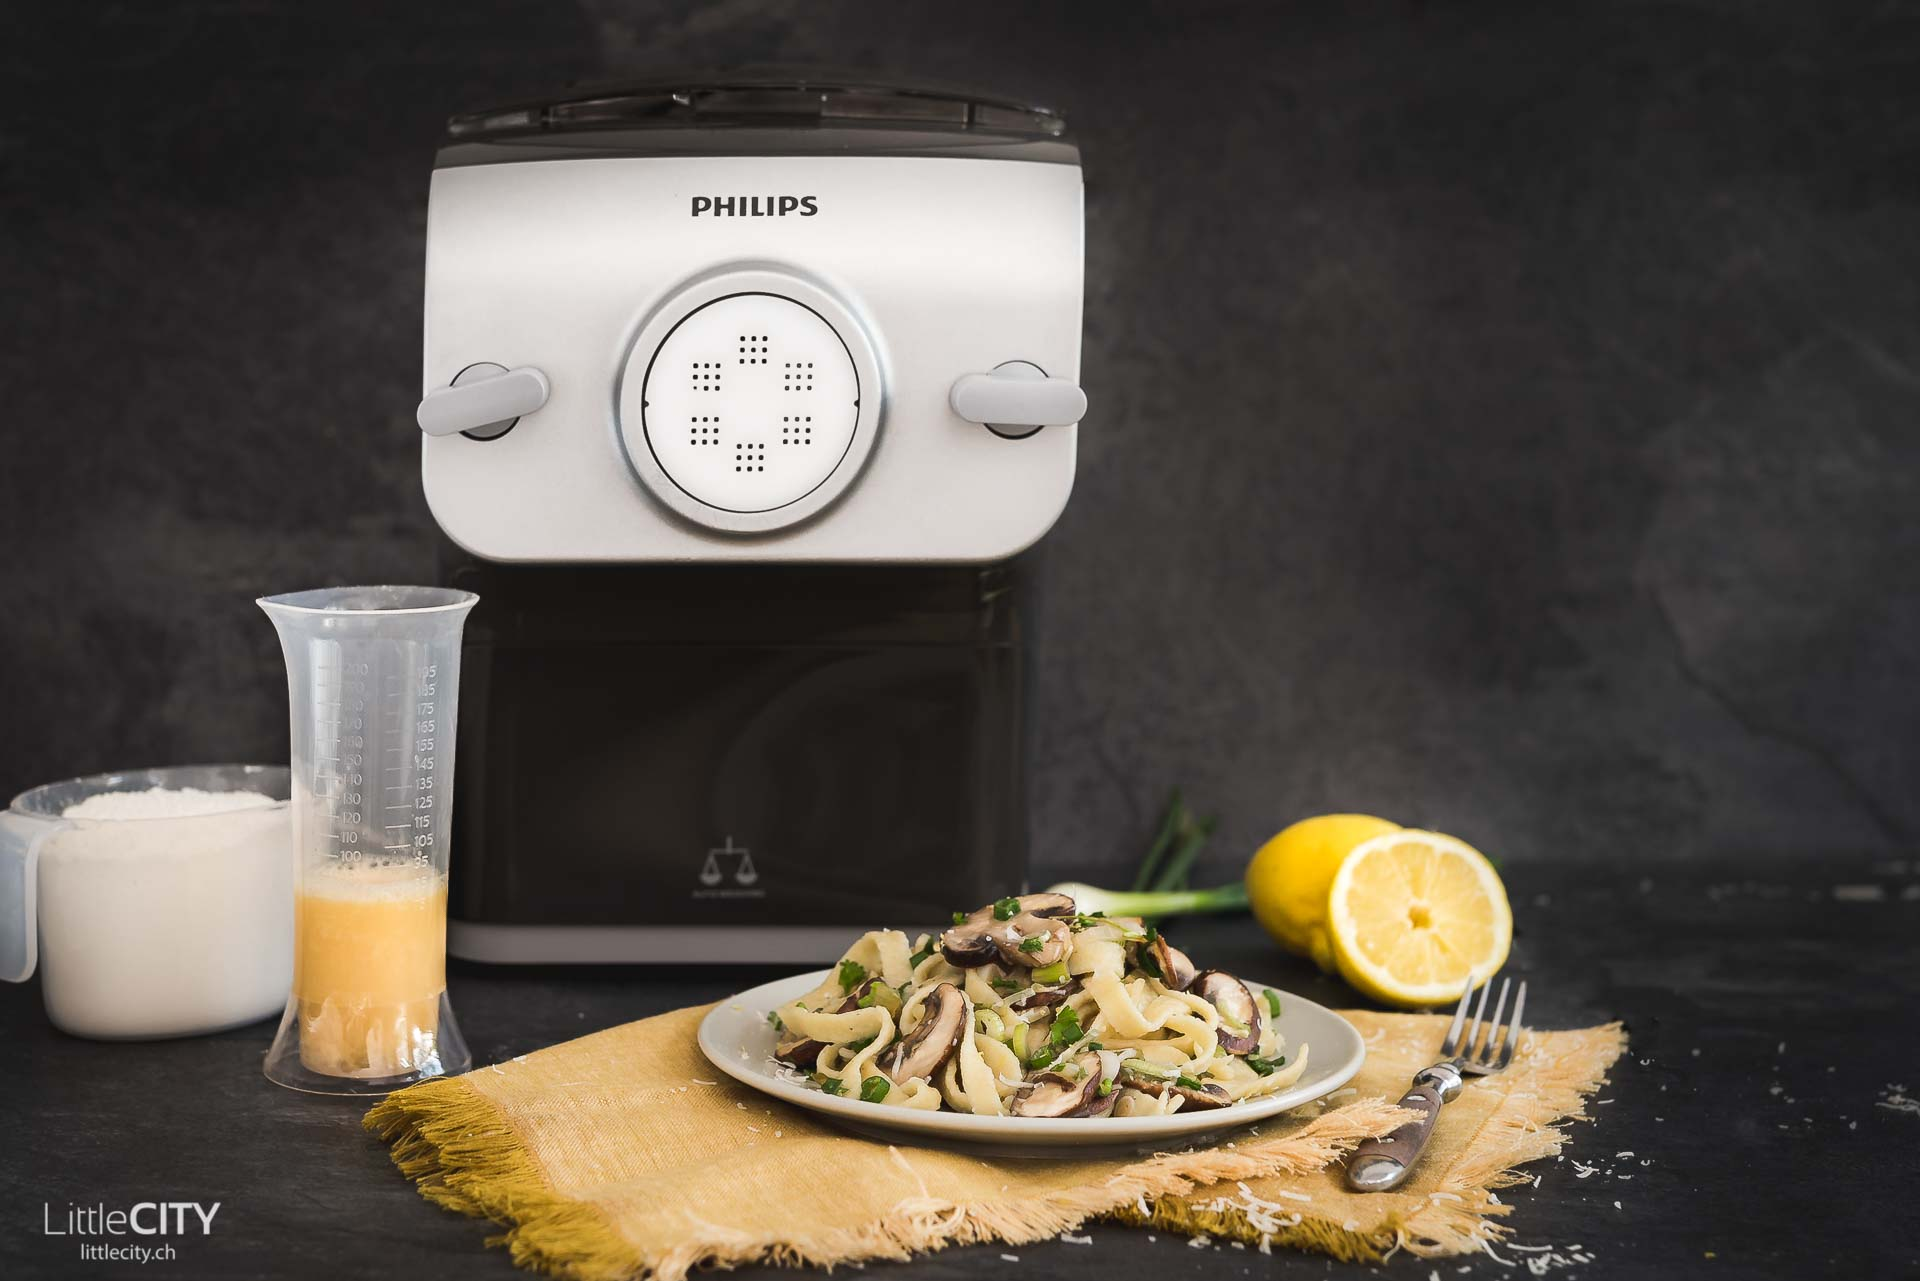 Philips Pastamaker Rezept & Test